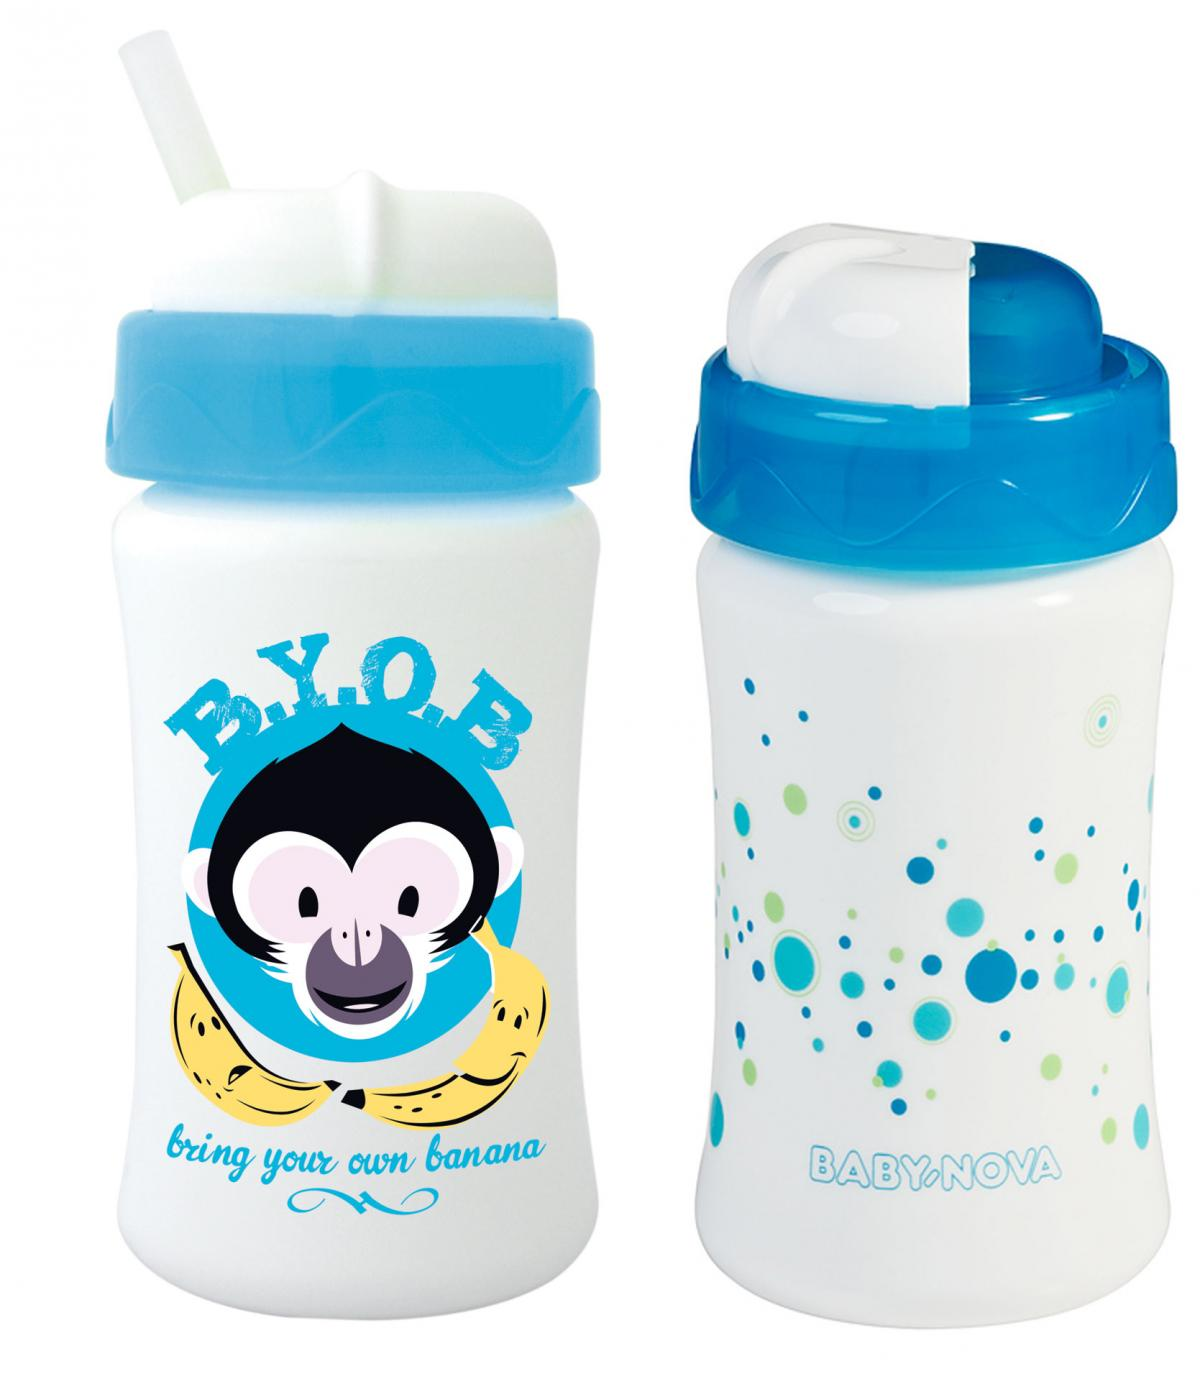 2 Stk Blau Baby-Nova Trinklernbecher 2 Stk Tropf Stopp Kinder-Becher